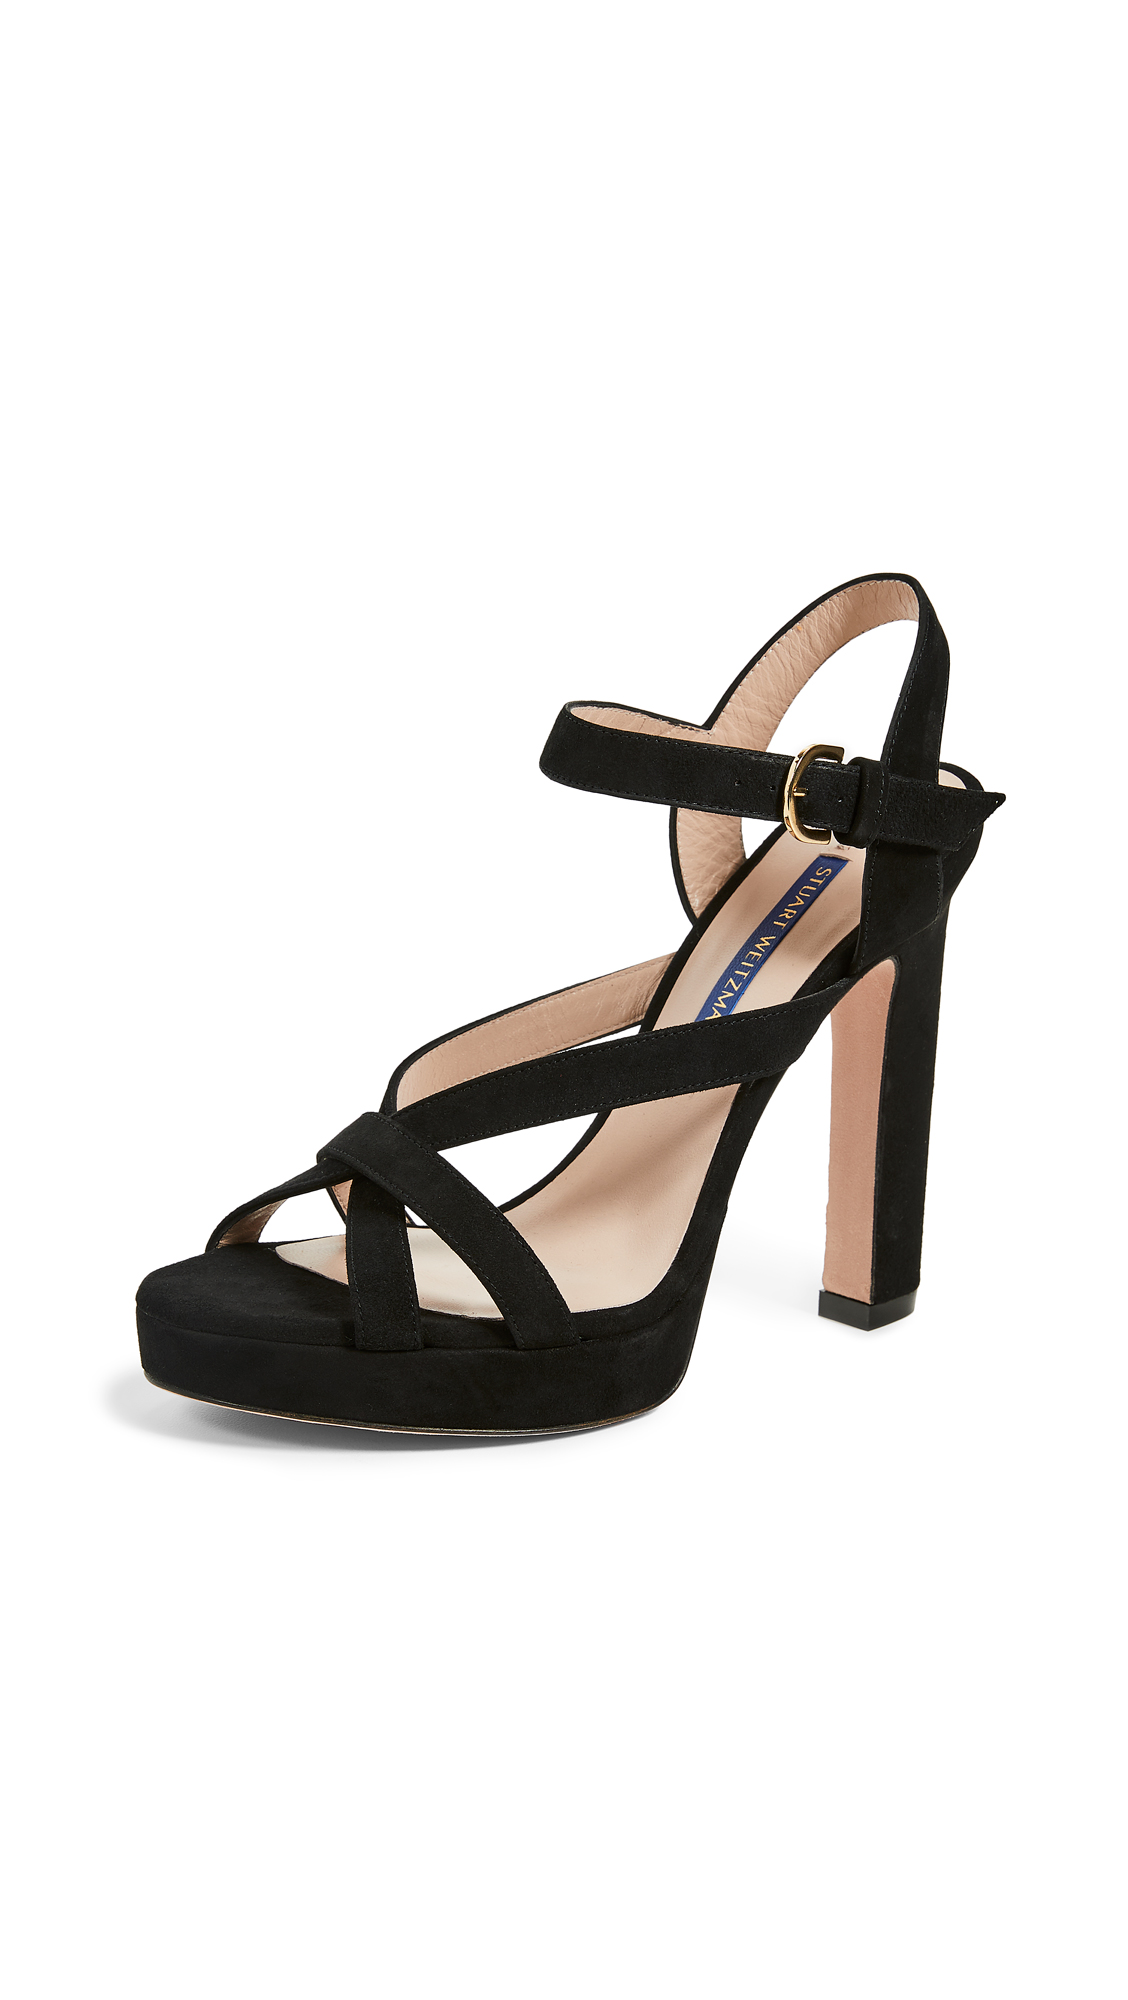 Stuart Weitzman Cersei Platform Sandals - Black